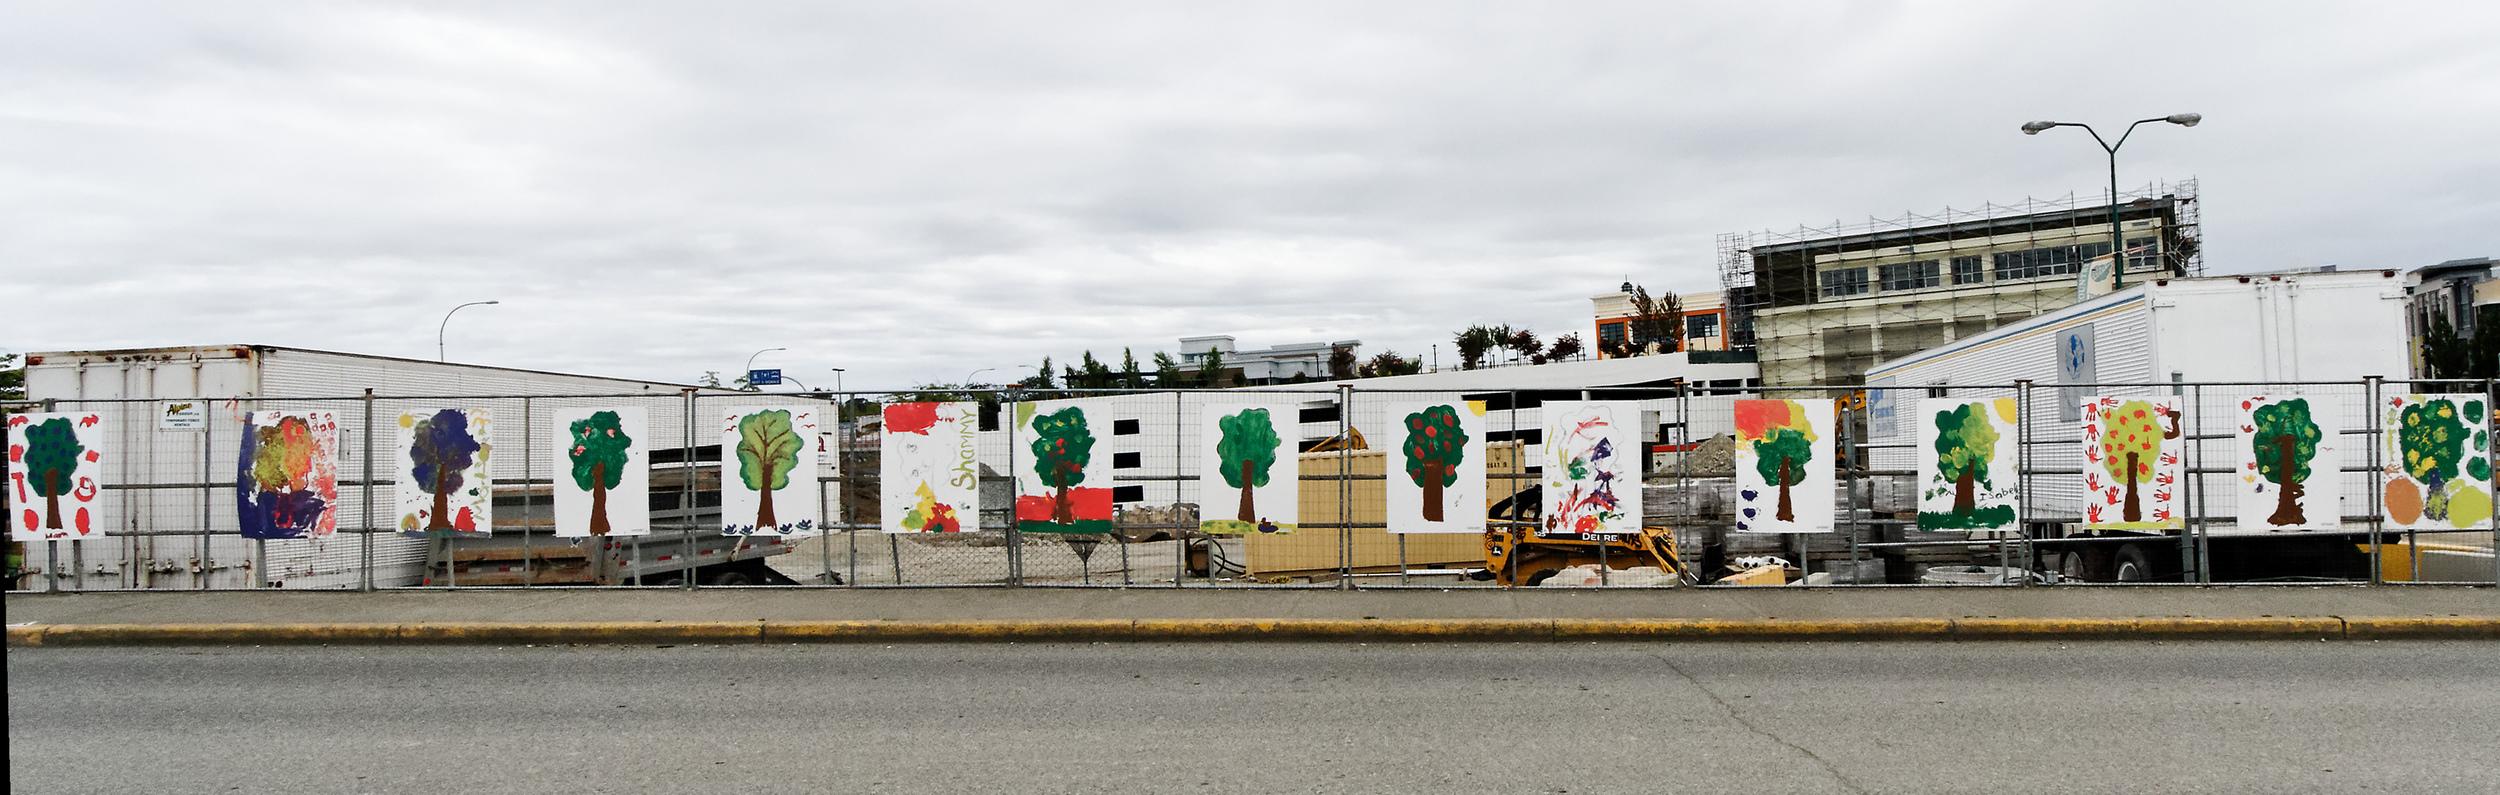 Painted Trees, Victoria B.C.